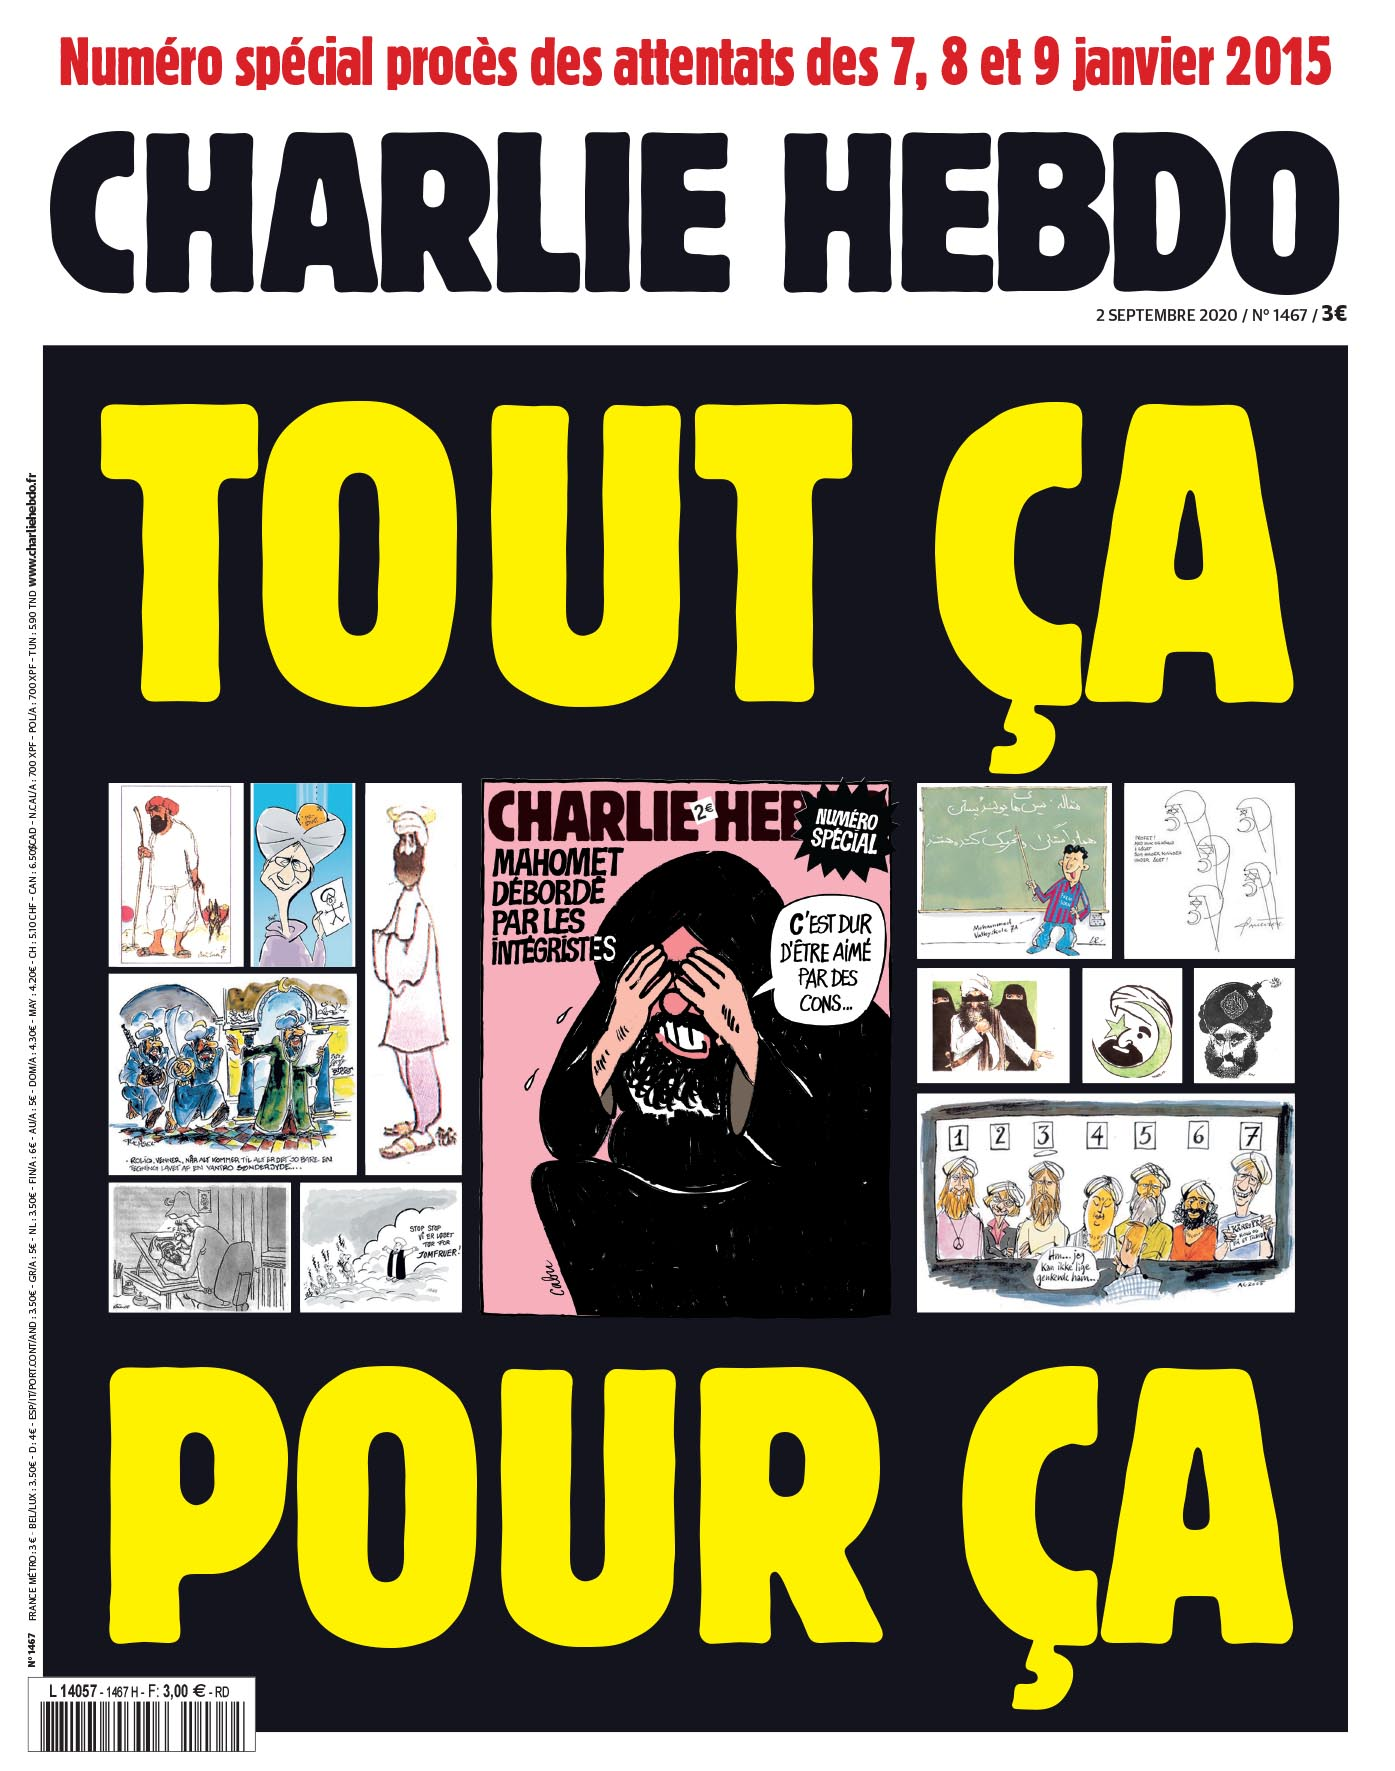 Charlie Hebdo n°1467 -- 2 septembre 2020 --- Tout ça pour ça